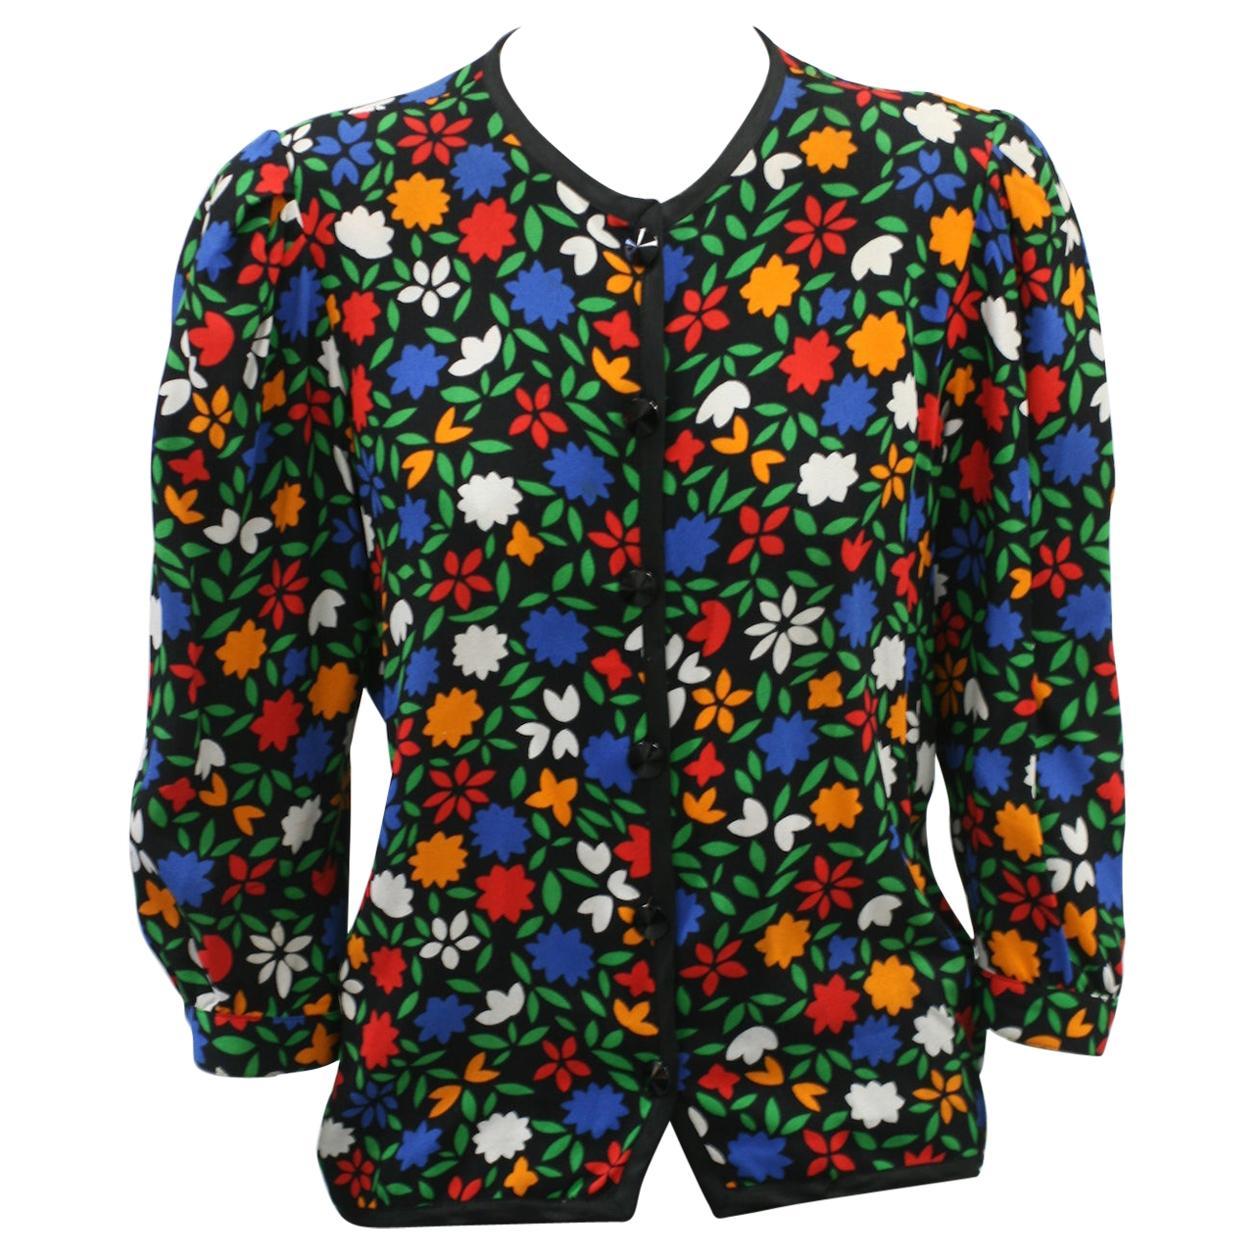 Yves Saint Laurent Rayon Crepe Jacket